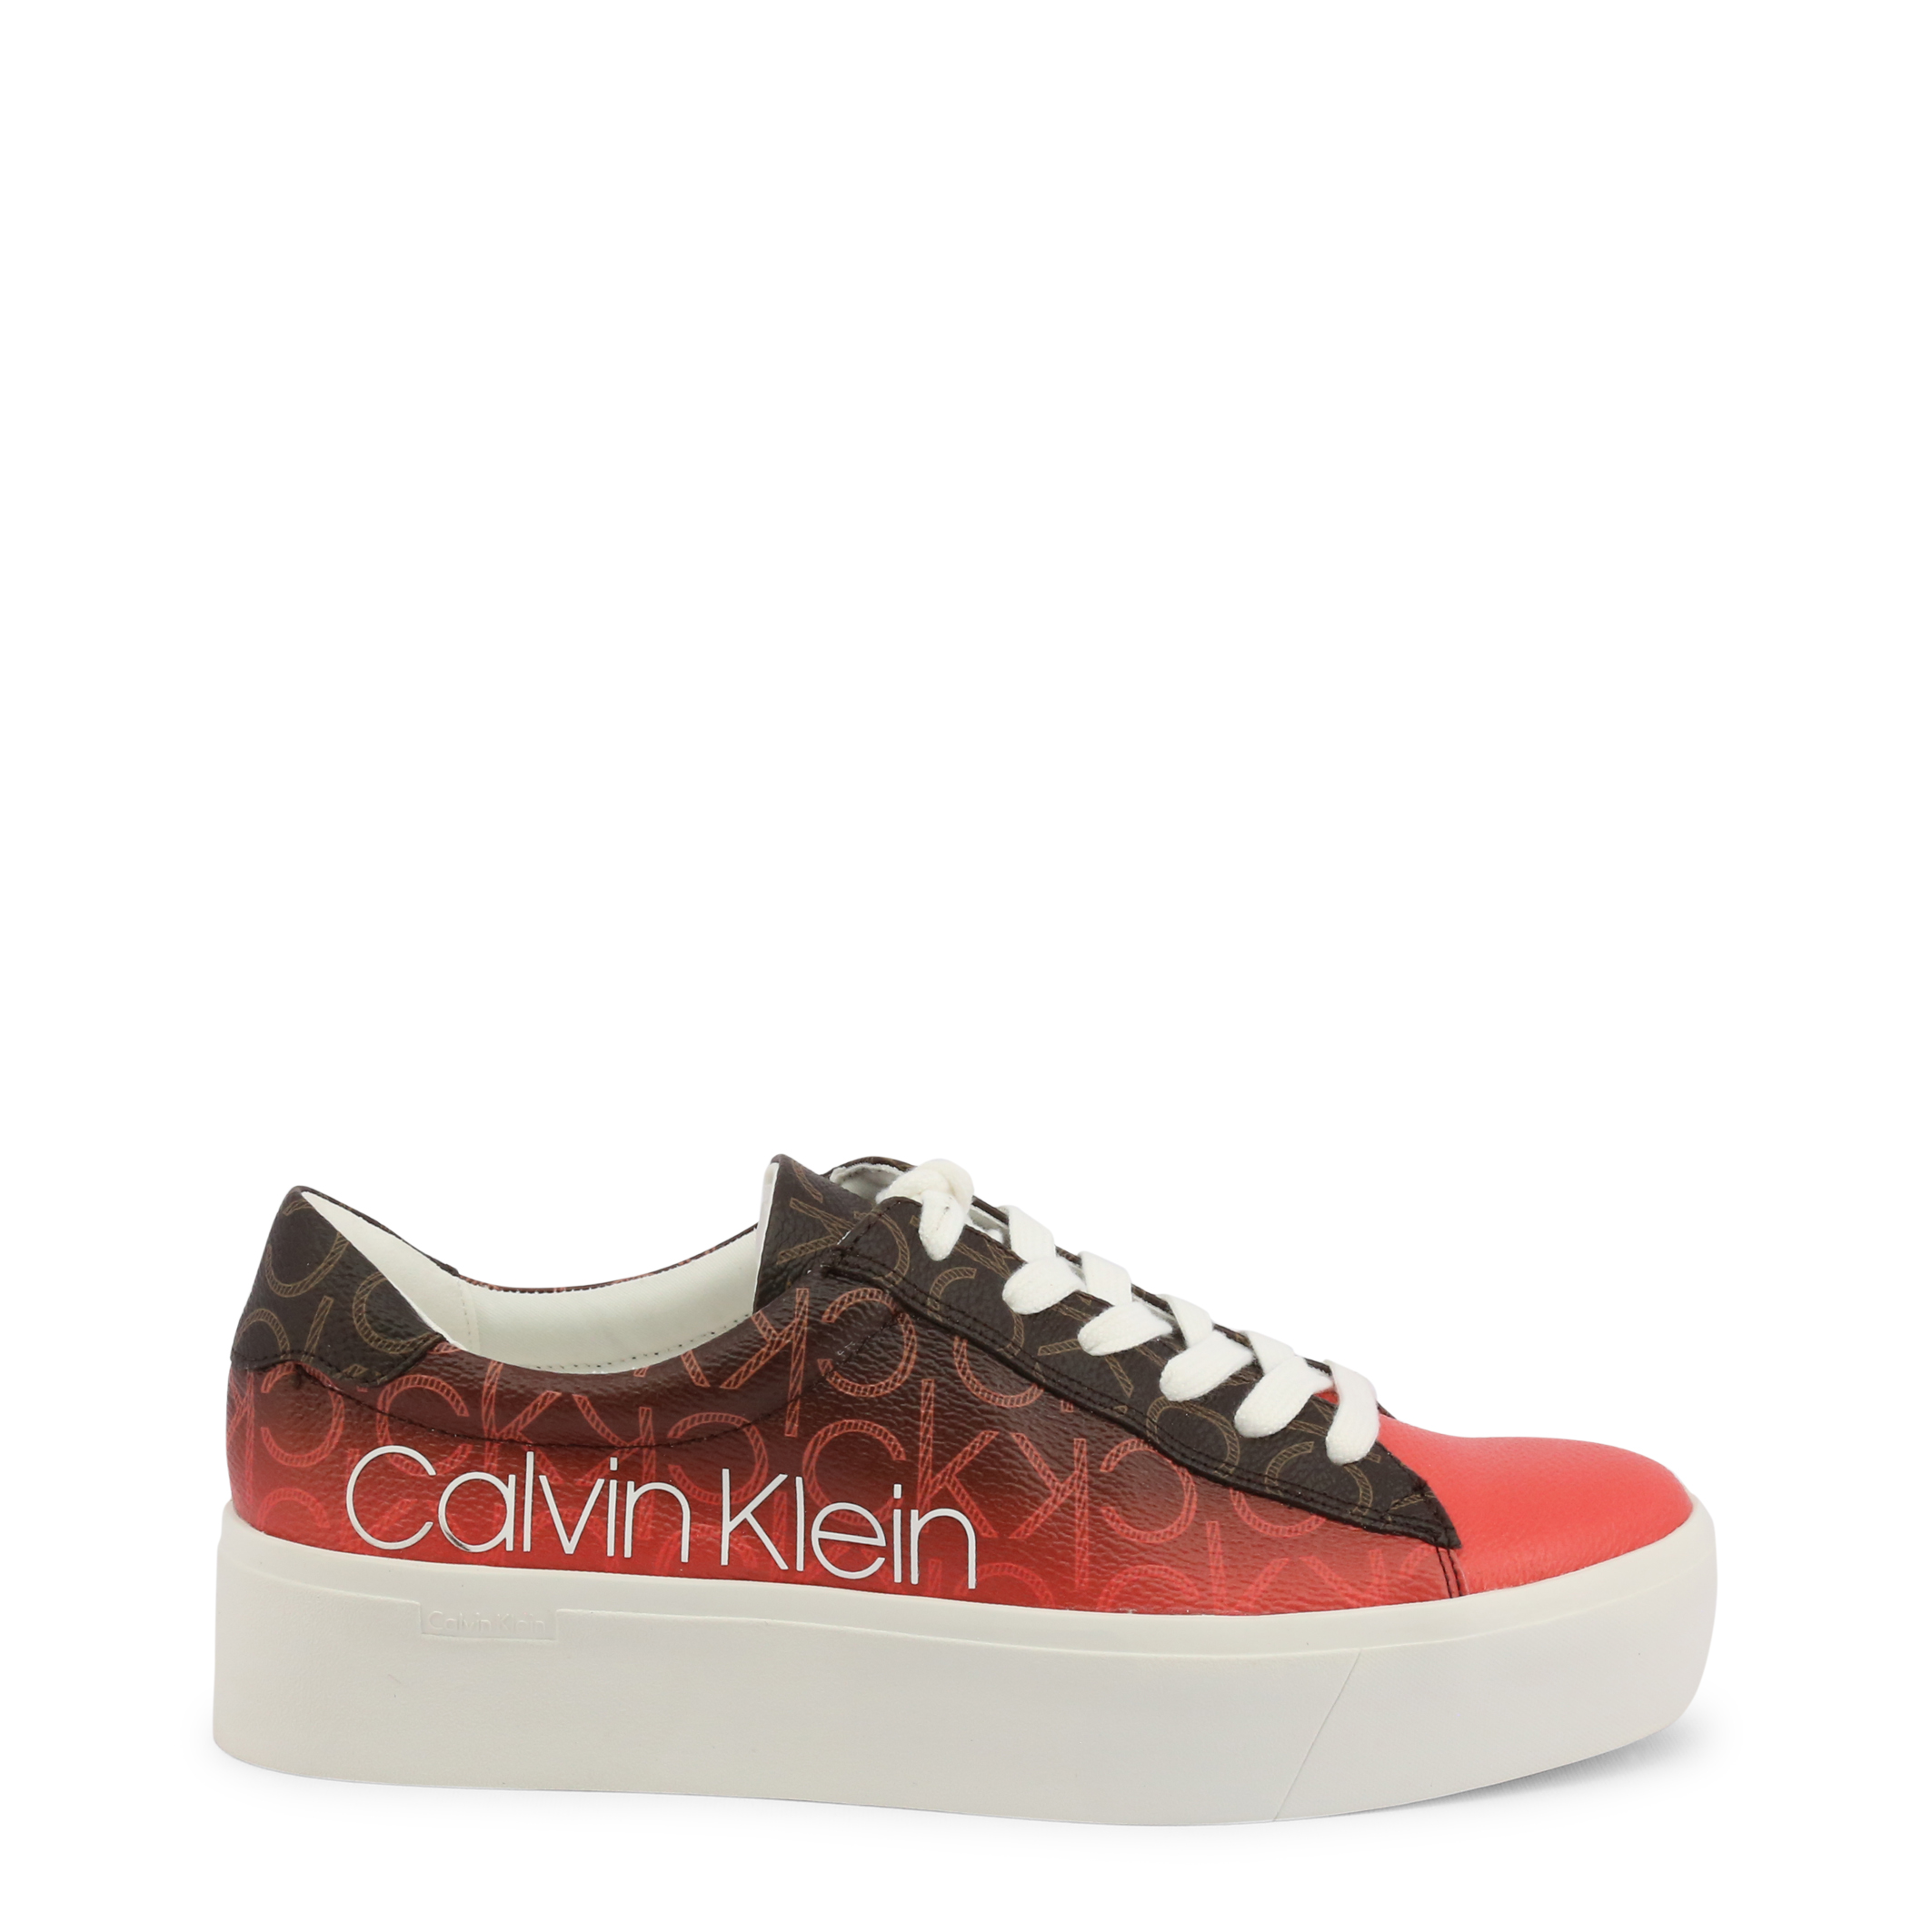 Calvin Klein - JANIKA_B4E7962 - Brown